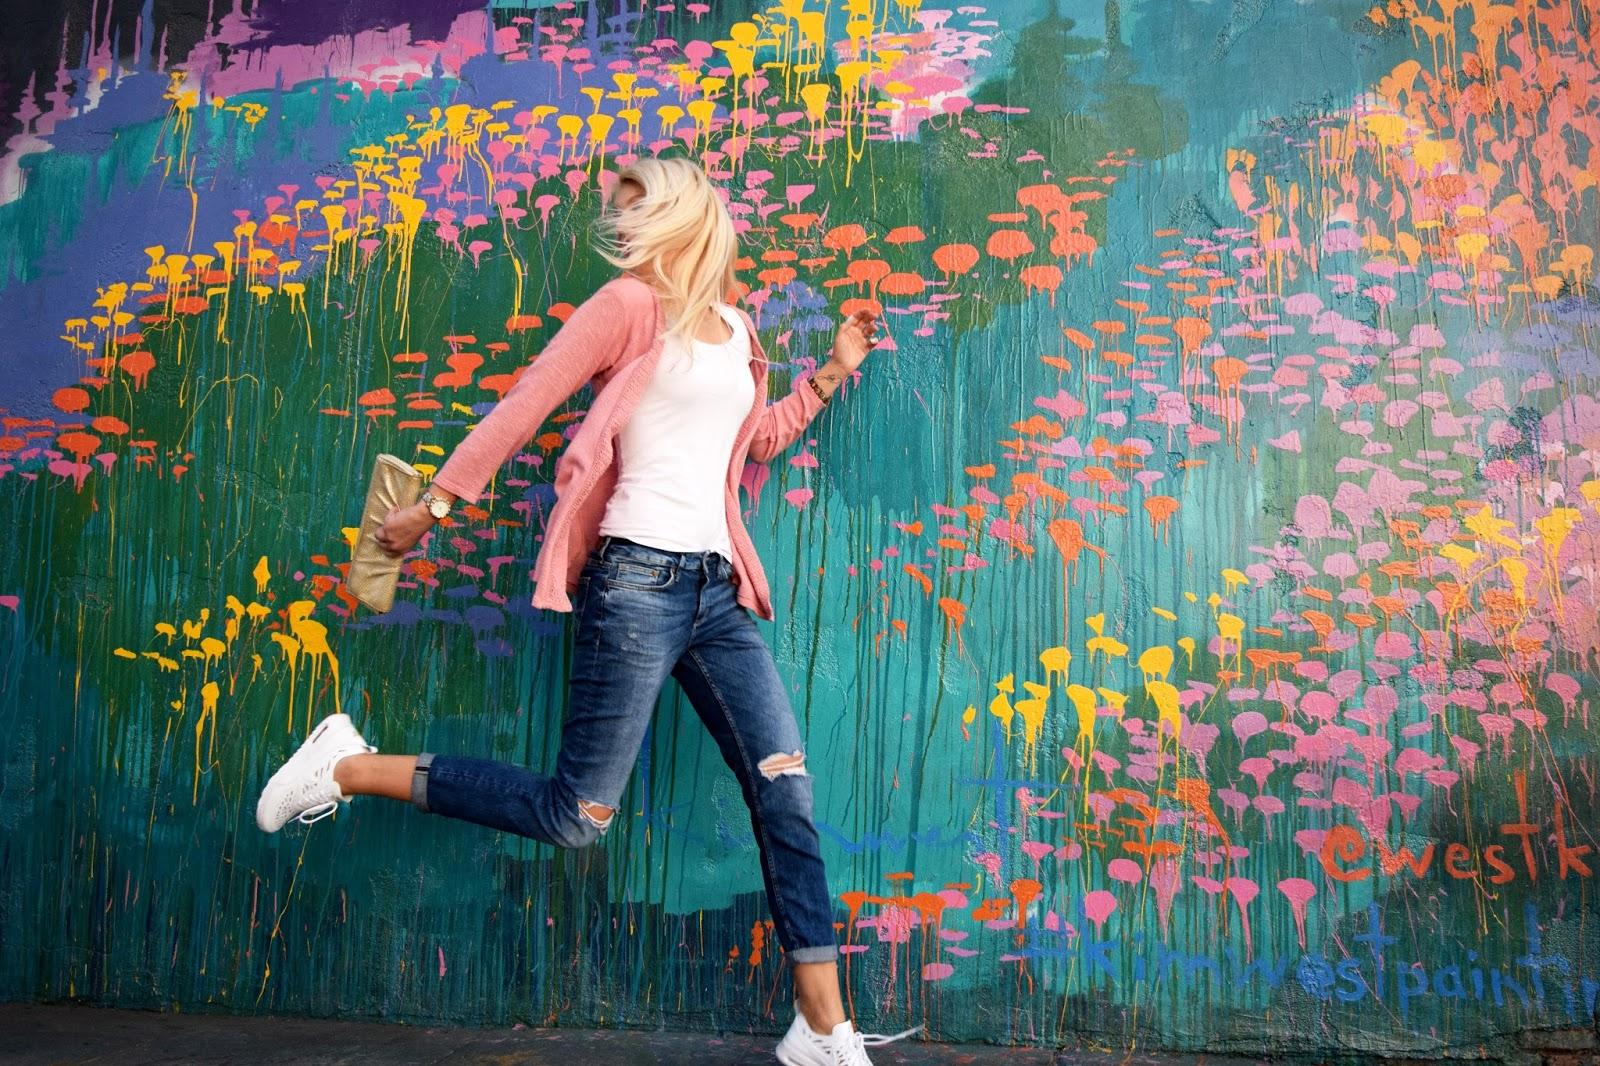 Nike air max thea, Nike, sneaker, boyfriend jeans, gold clutch, pink, pink cardigan